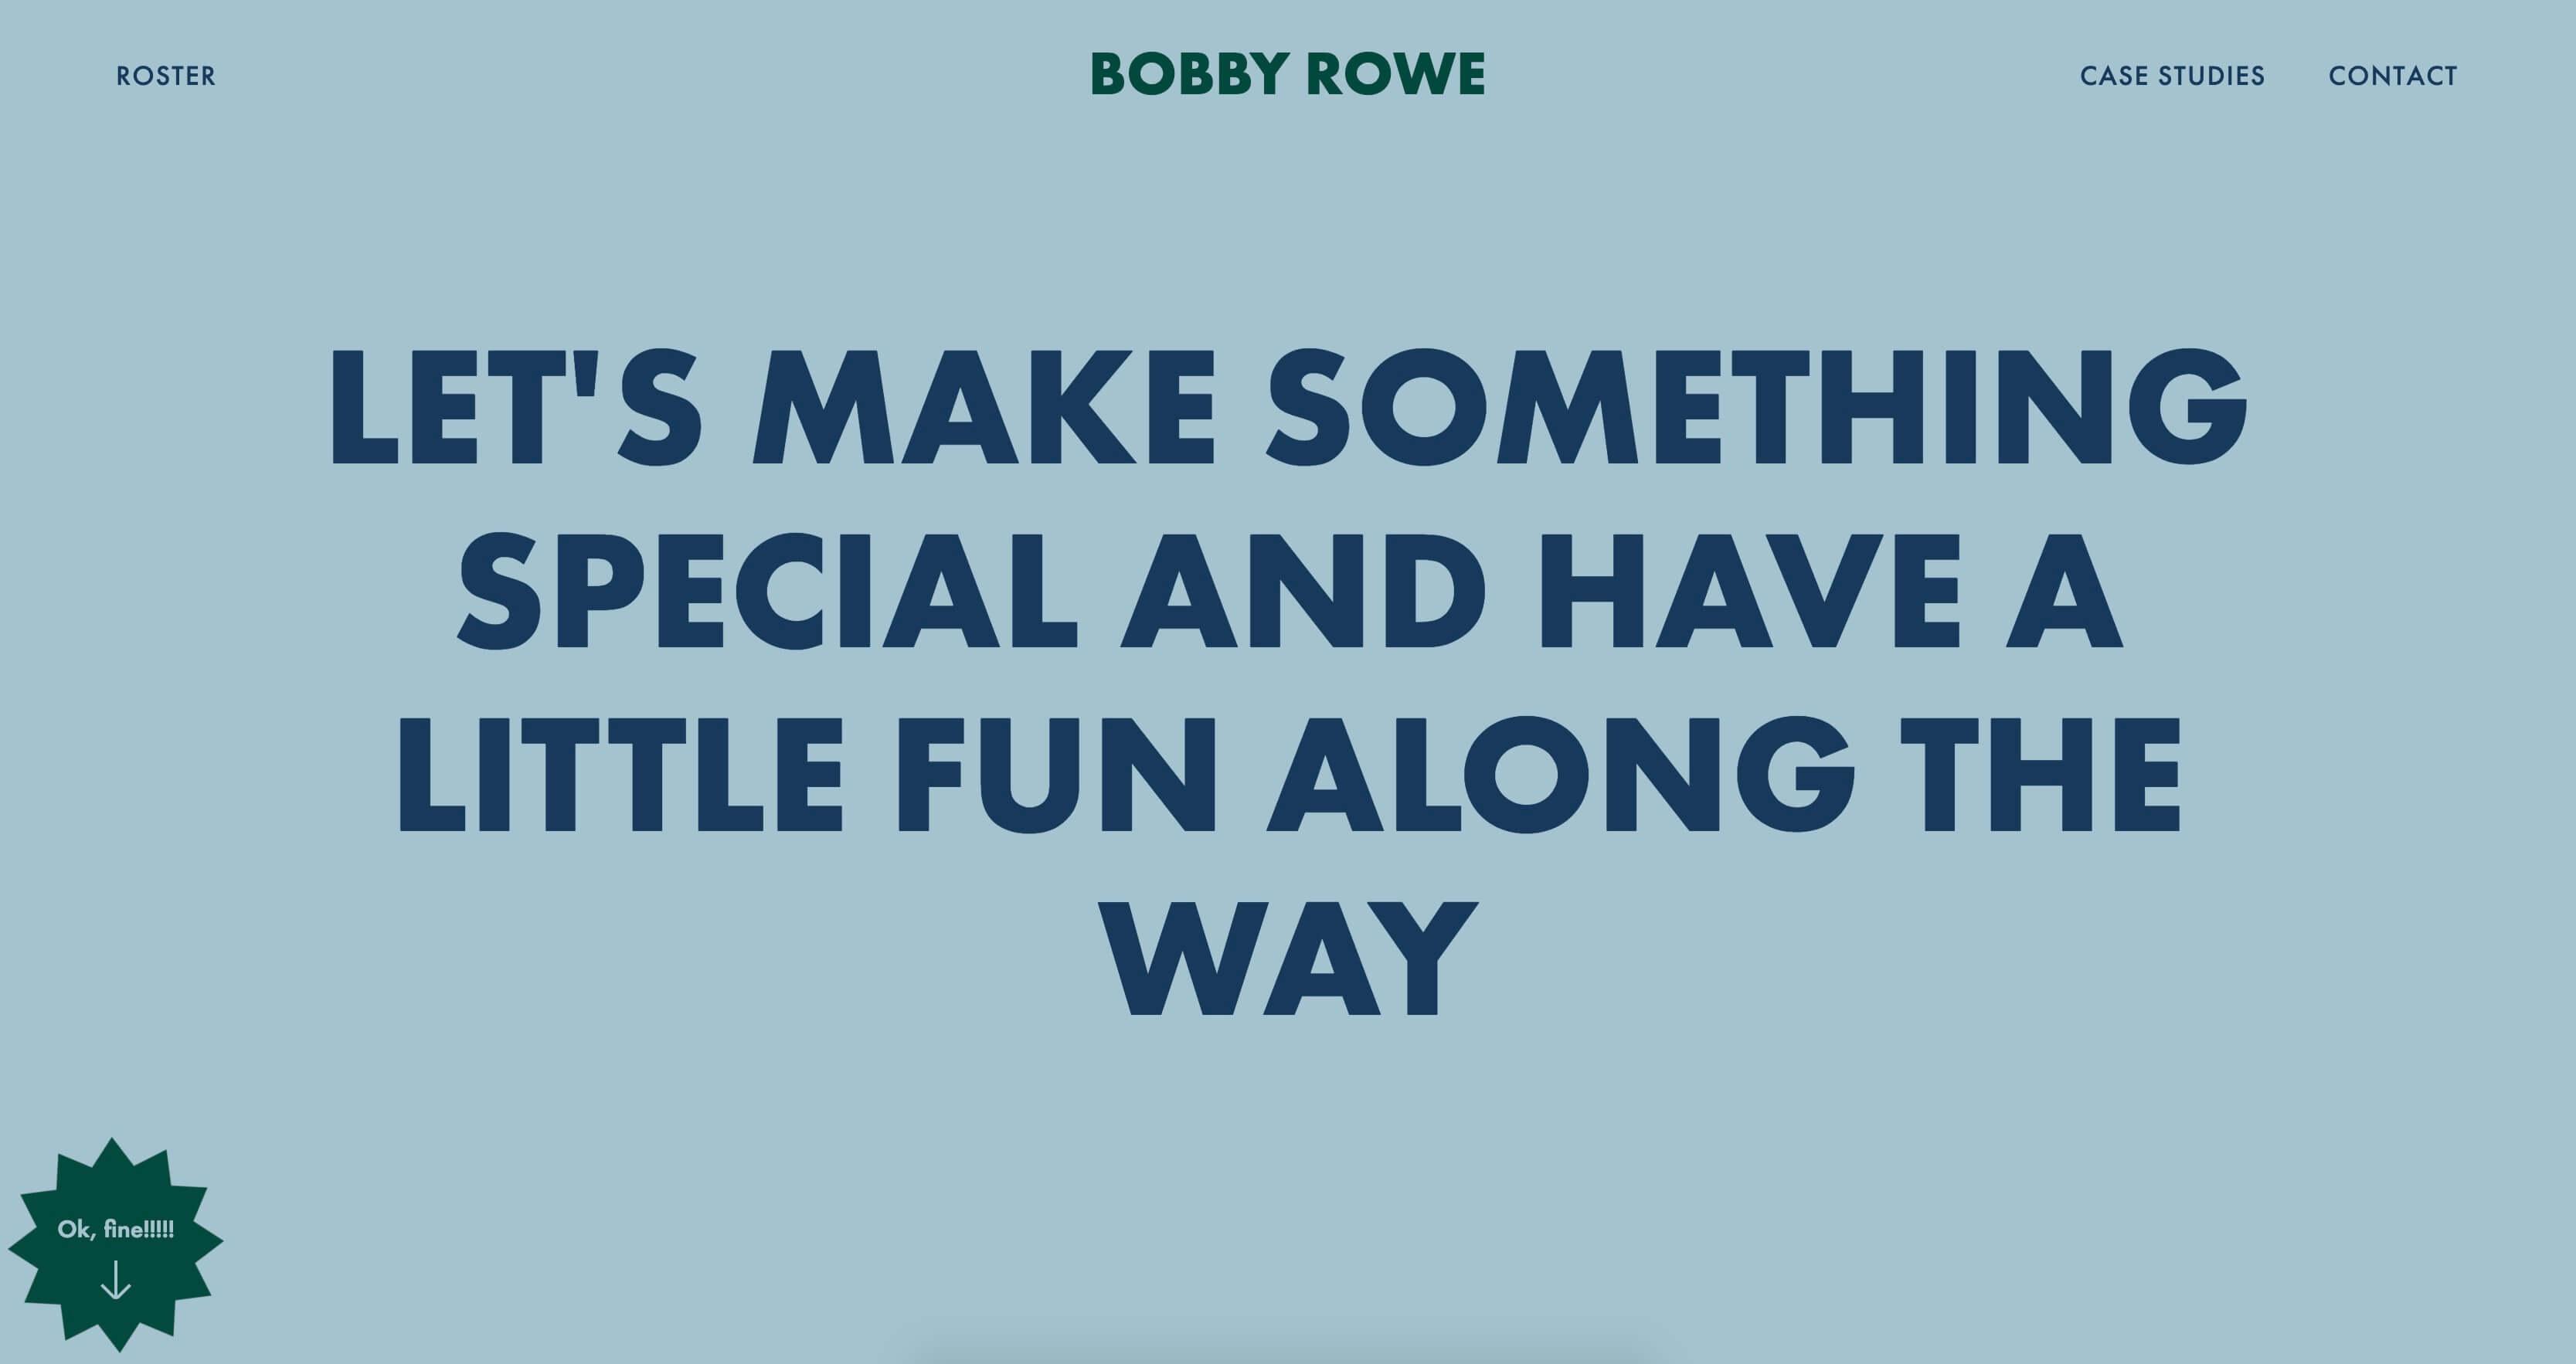 screenshot of Bobby Rowe's personal website